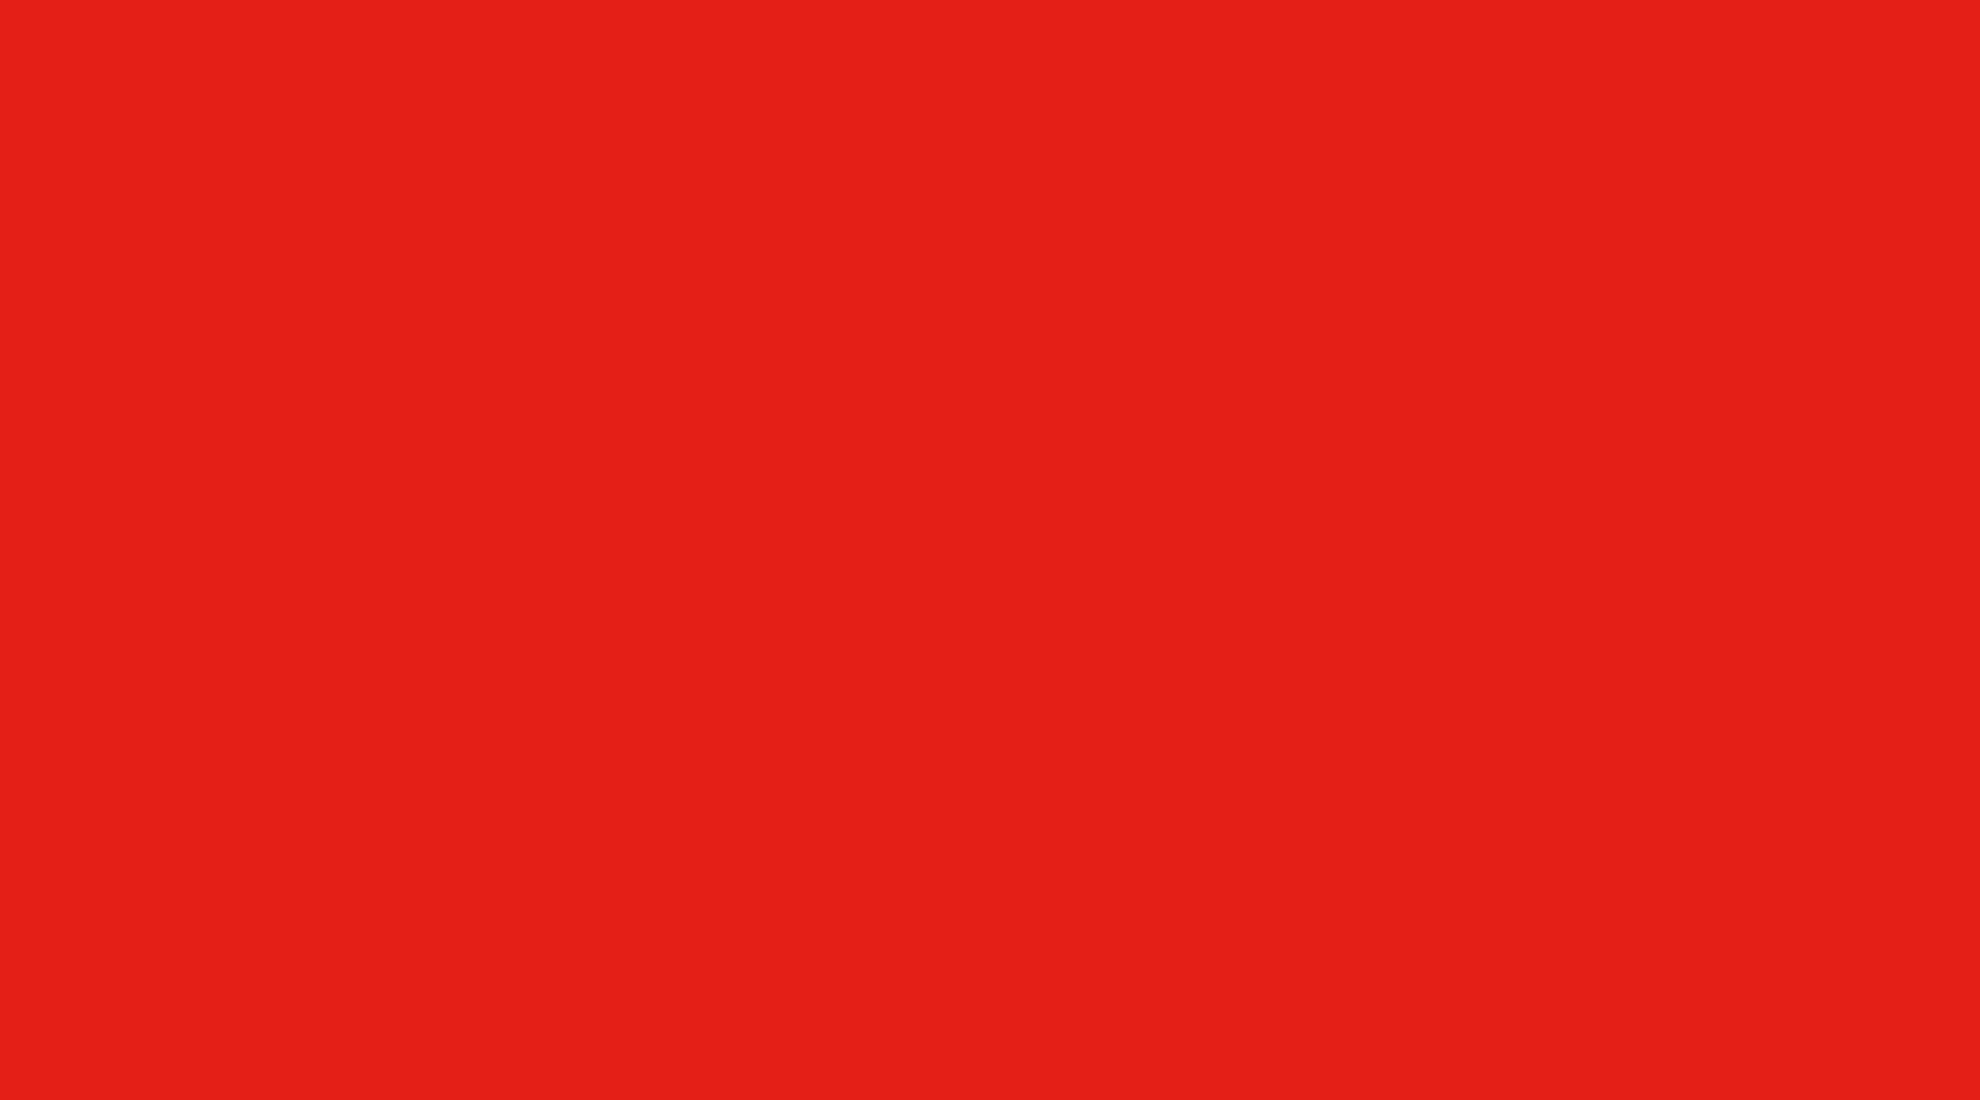 Red-Colour-Block-1980x1100